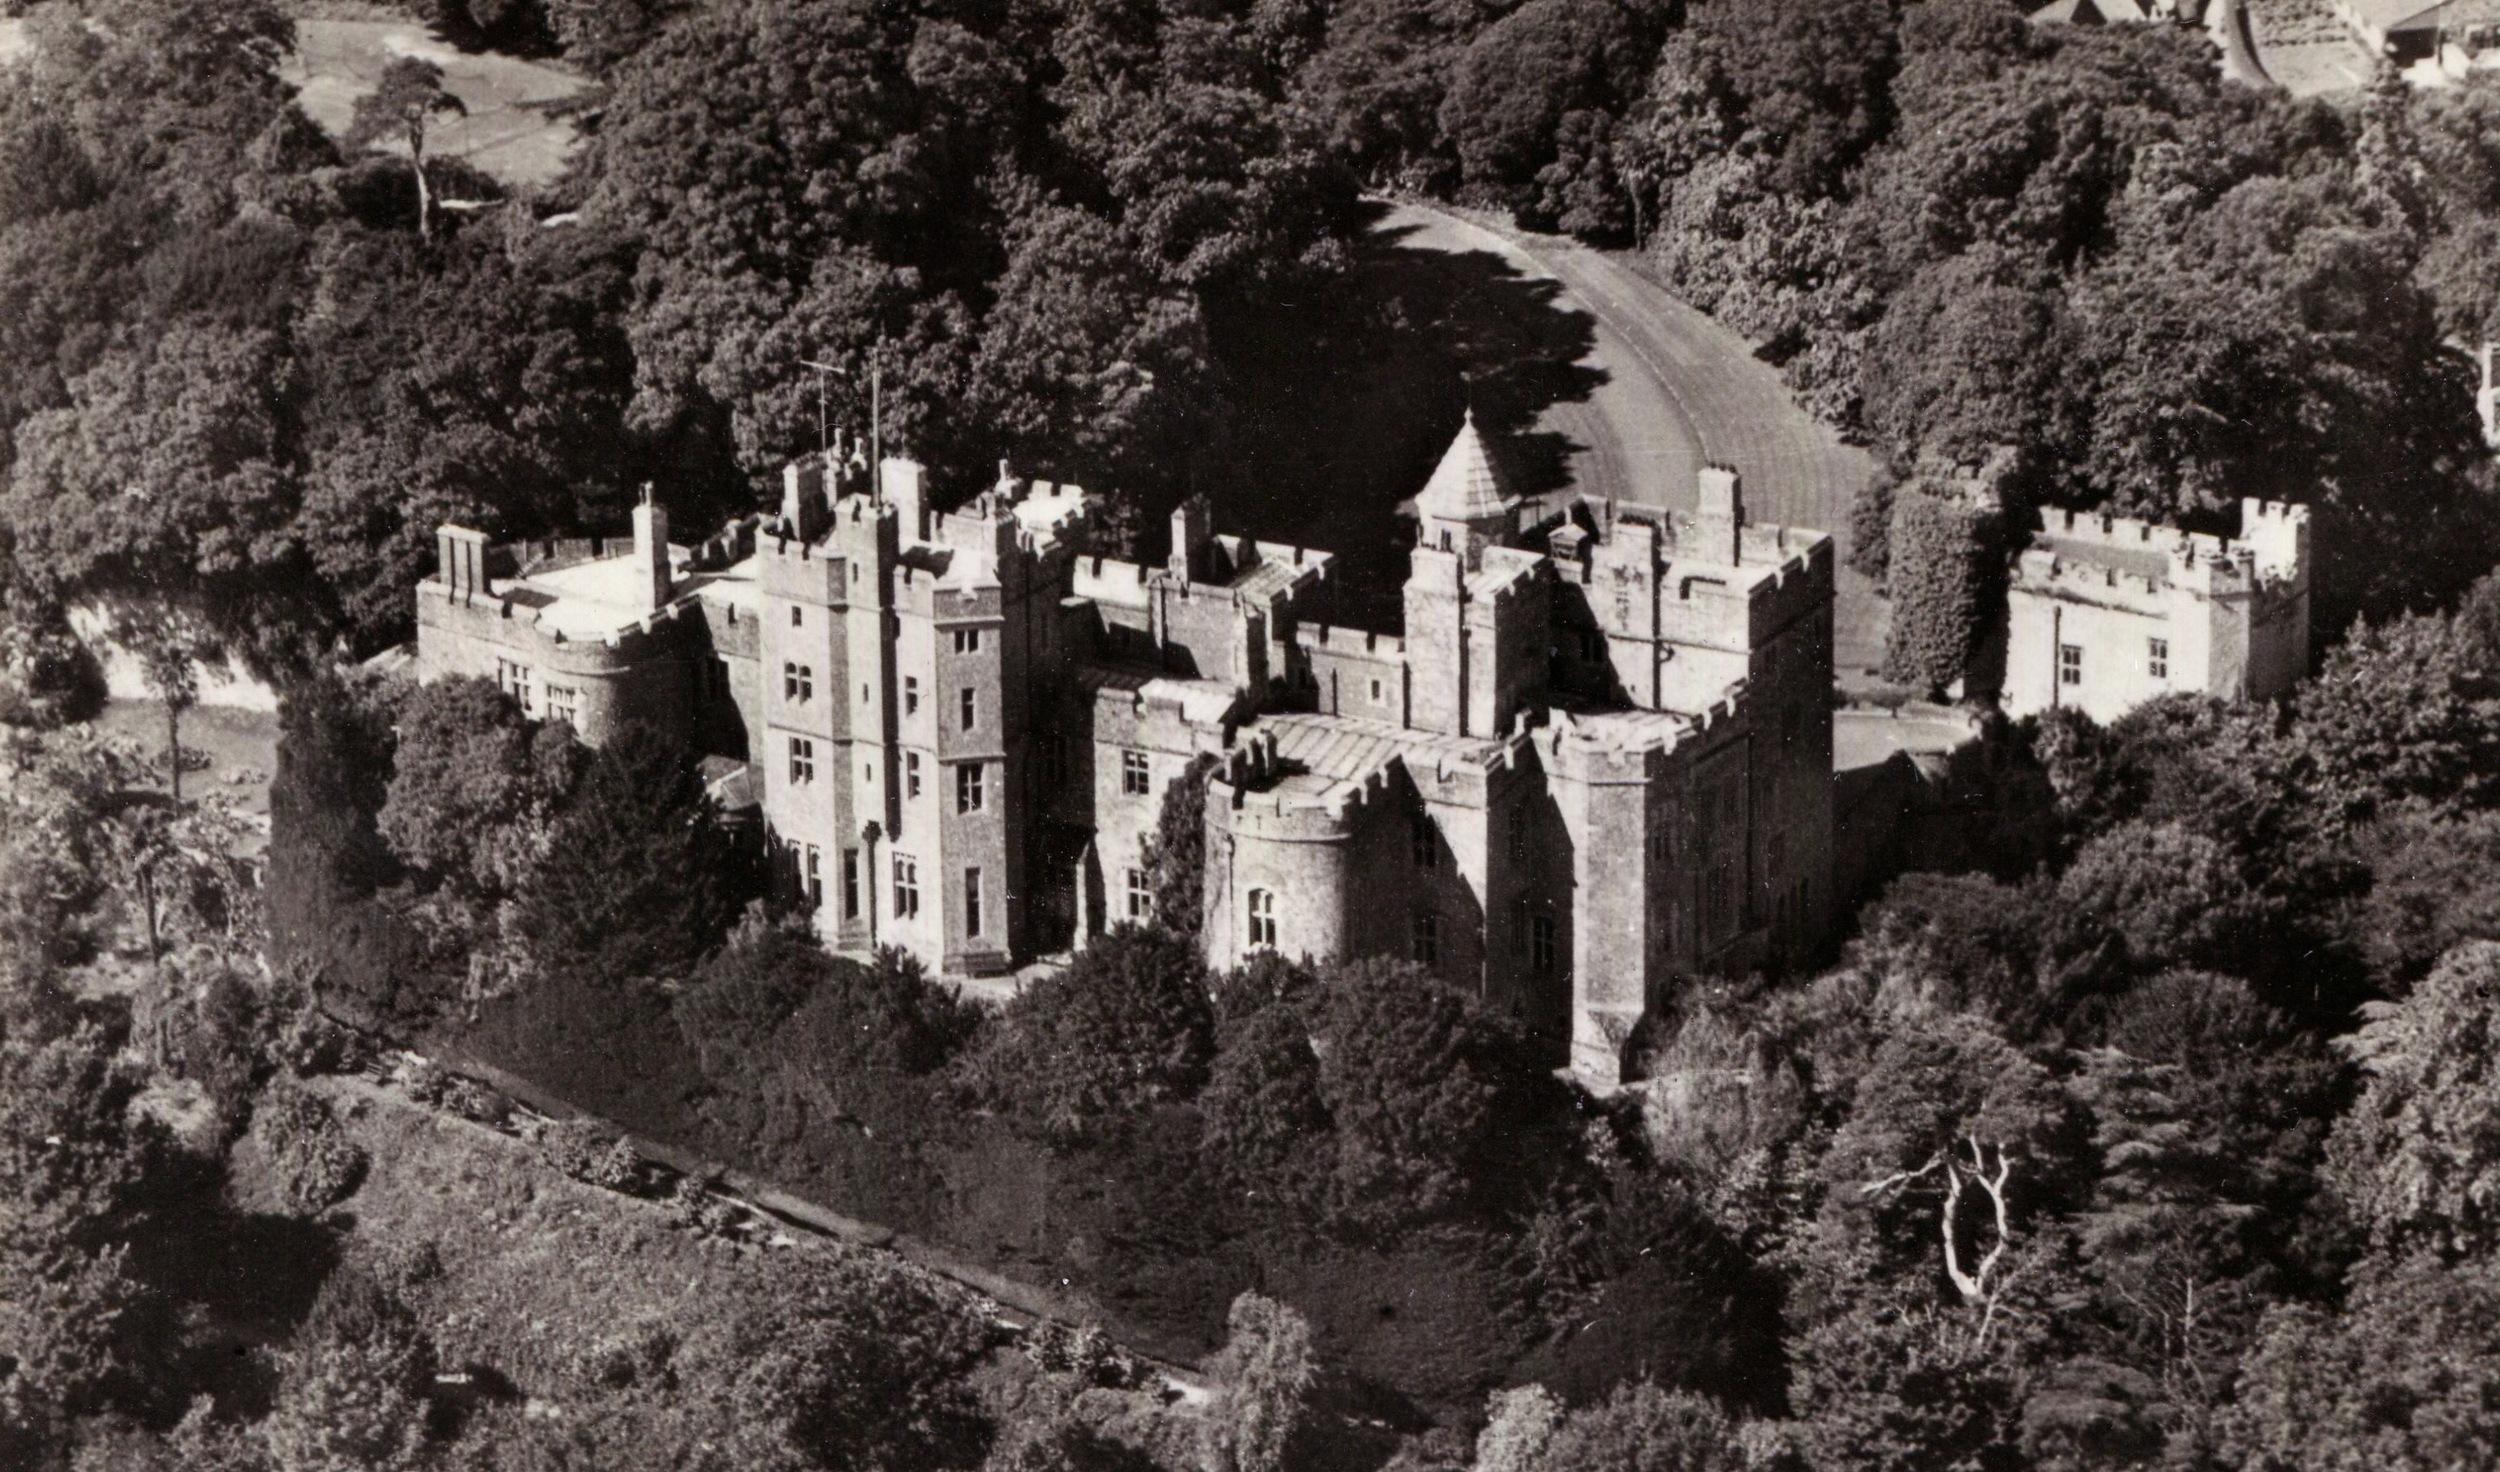 Dunster Castle, Scotland